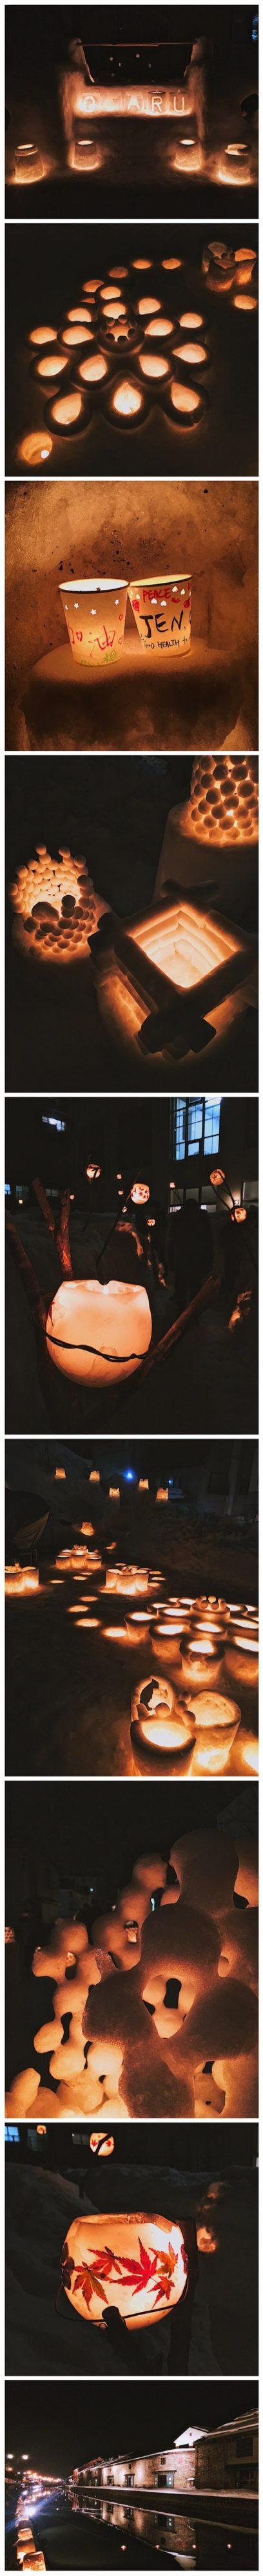 Otaru Snow Light Path Festival Night Illumination